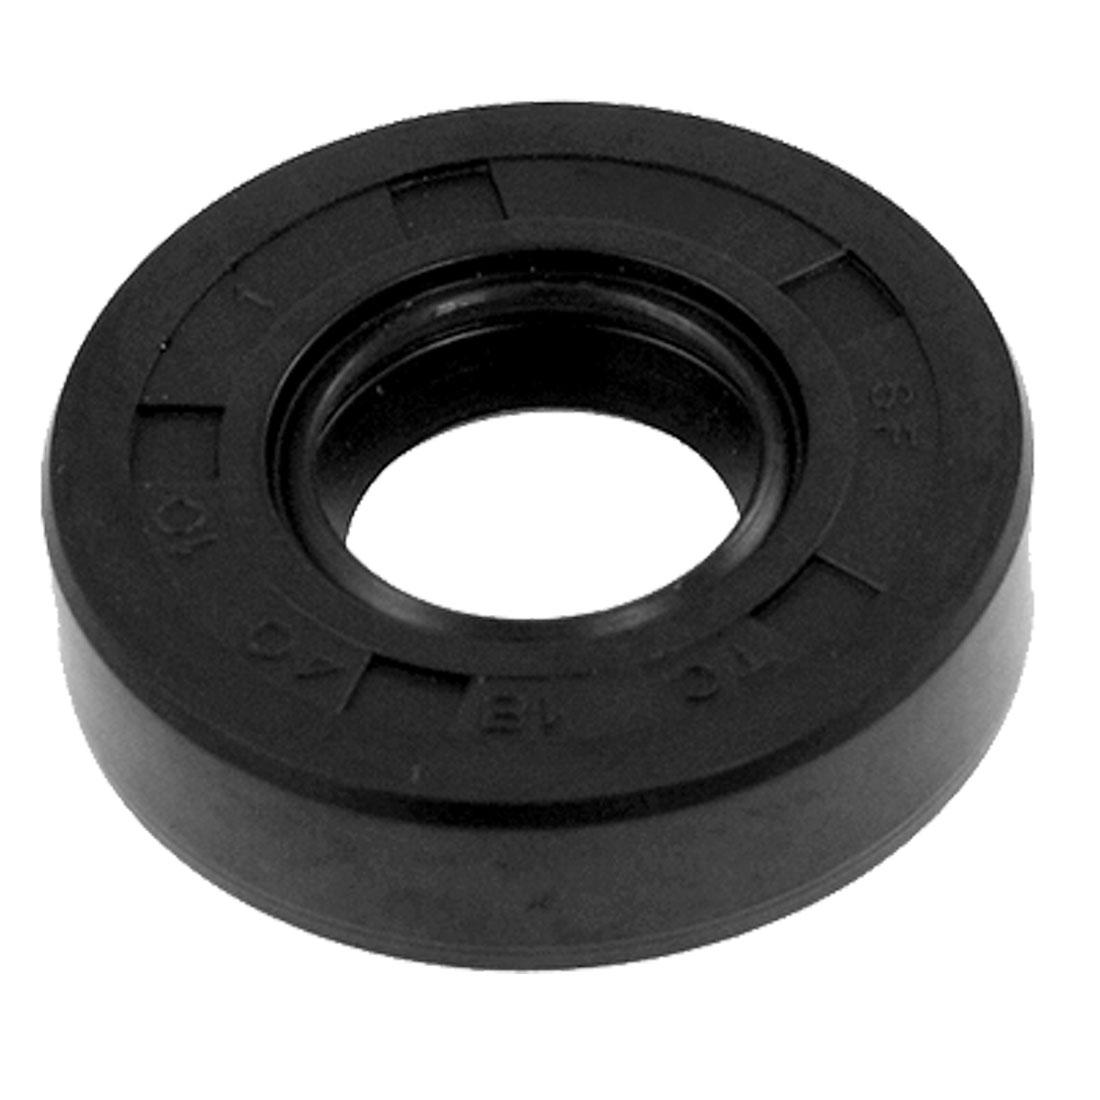 Steel Garter Spring Double Lip TC Oil Shaft Seal 18mm x 40mm x 10mm